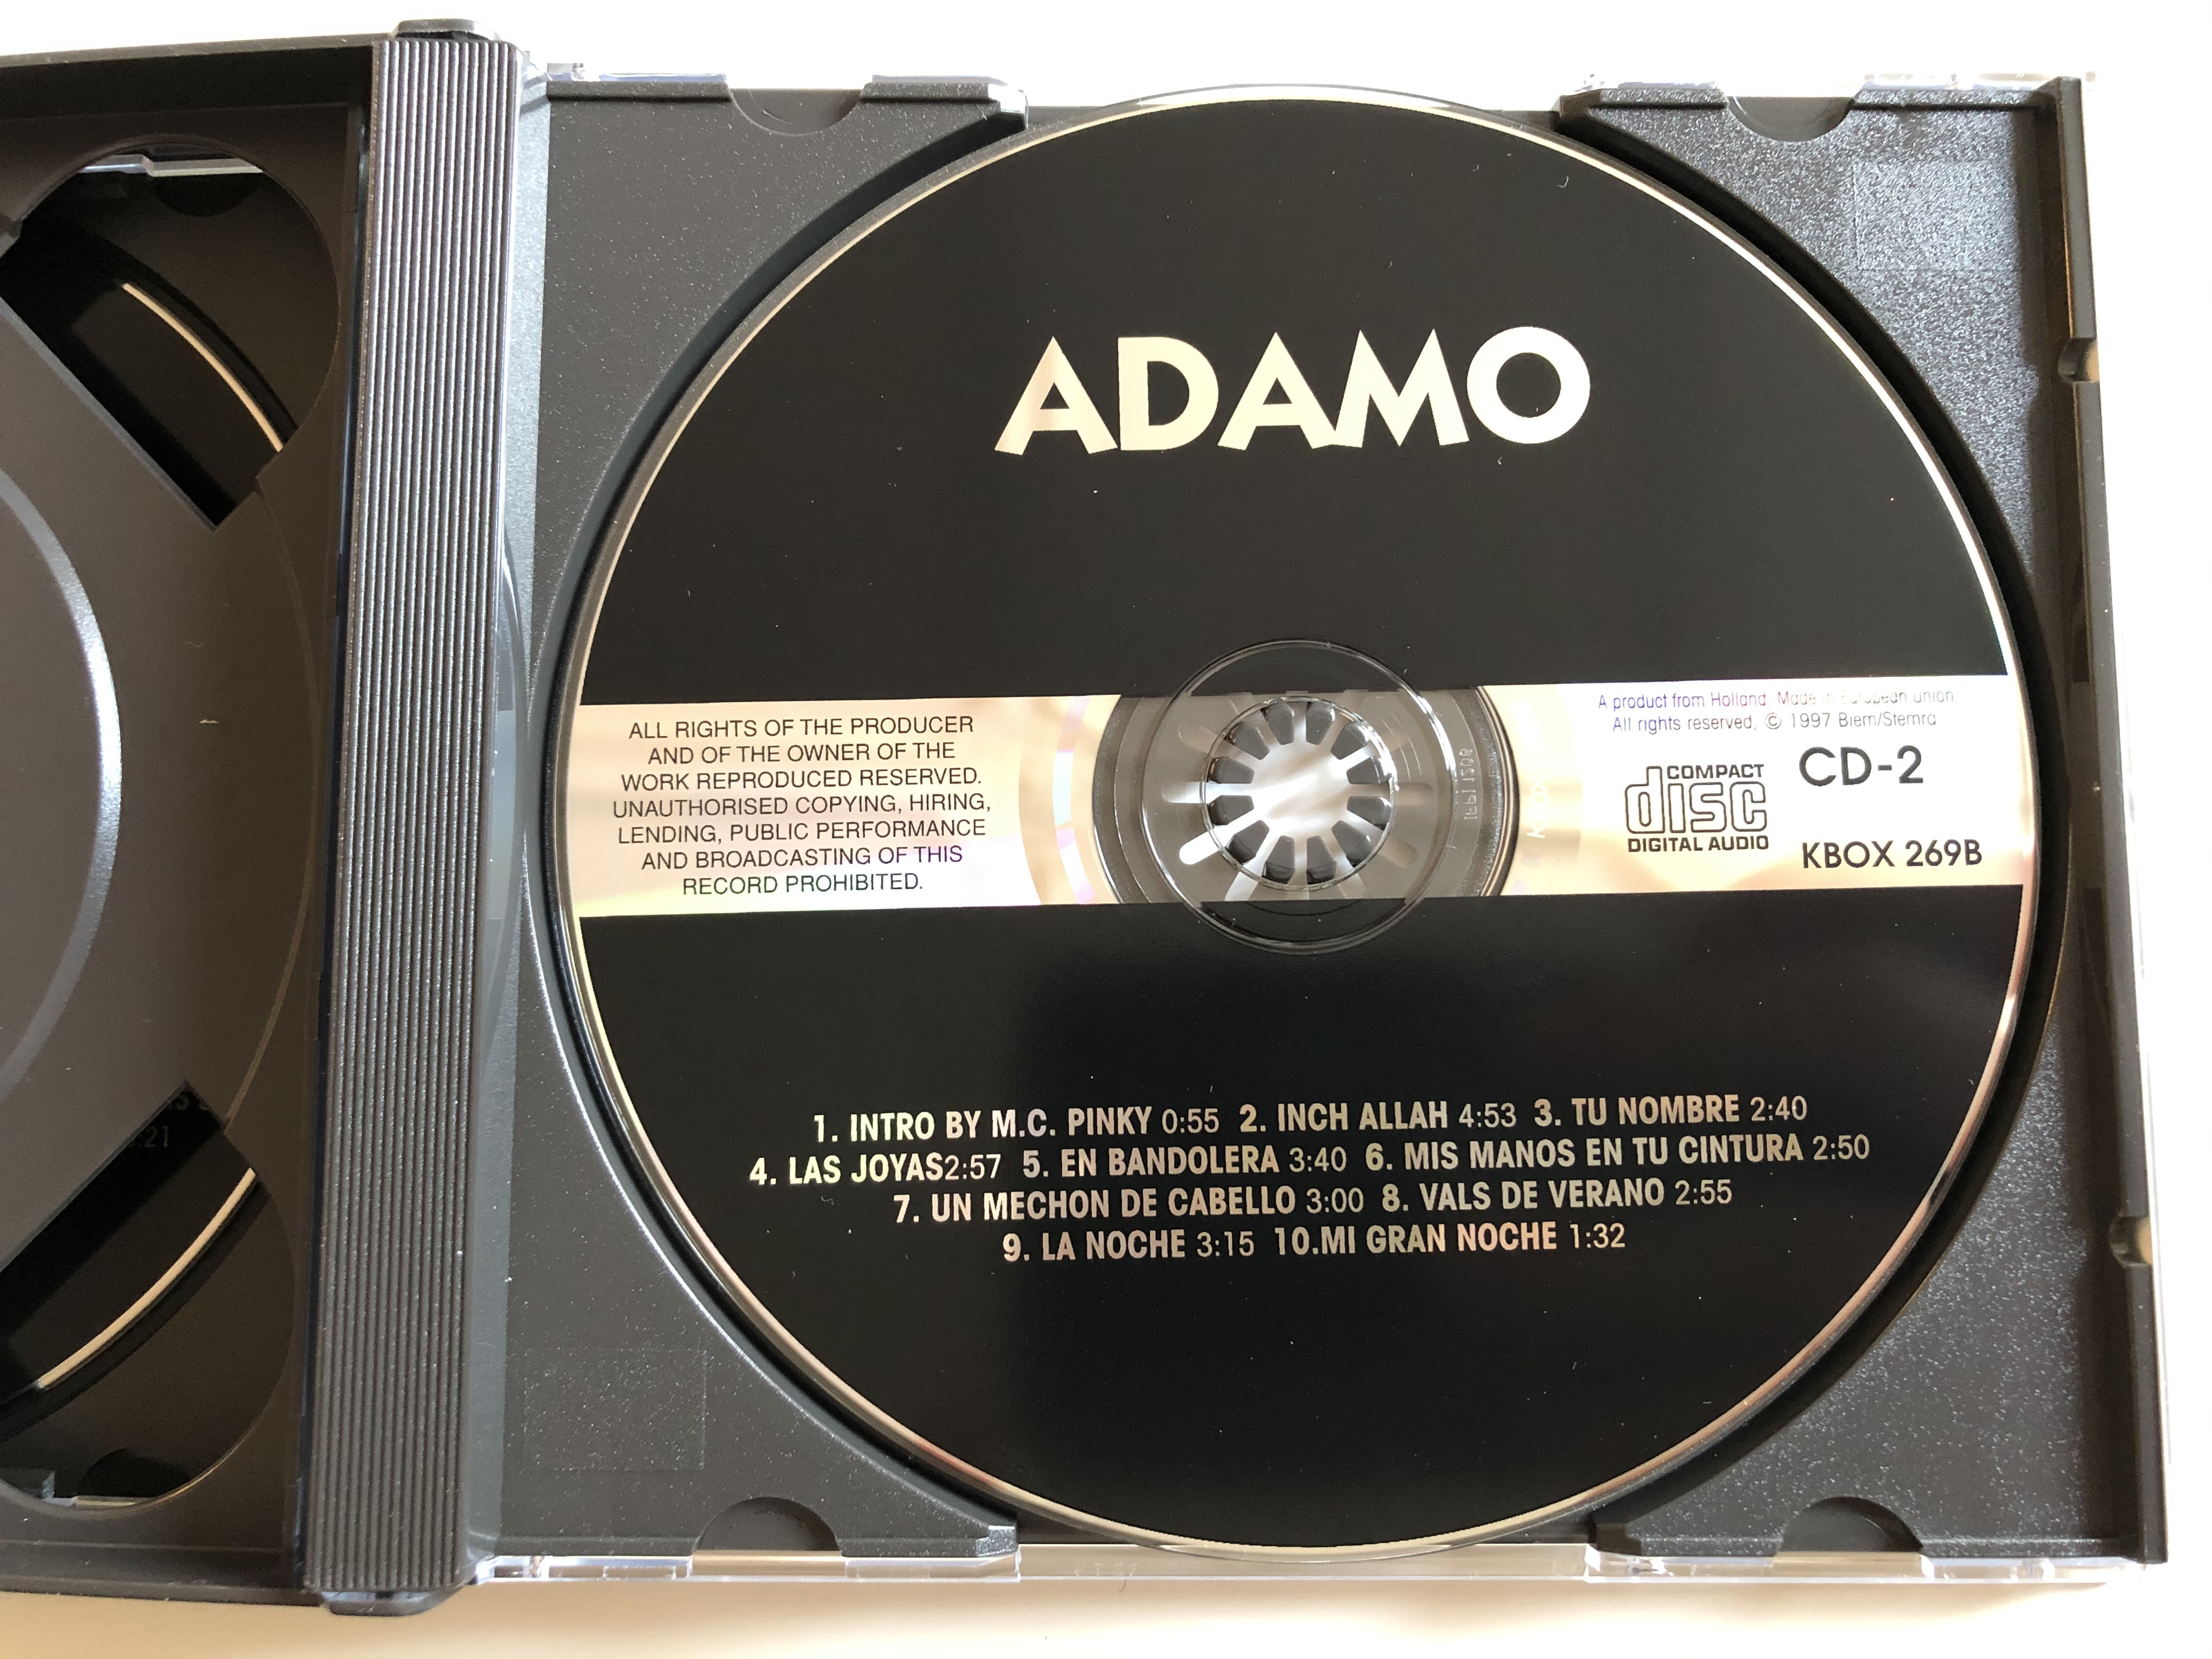 adamo-la-noche-las-joyas-tu-nombre-se-feliz-rosa-ya-se-durmio-sin-siquiera-hablar-biemstemra-2x-audio-cd-1997-kbox-269-3-.jpg